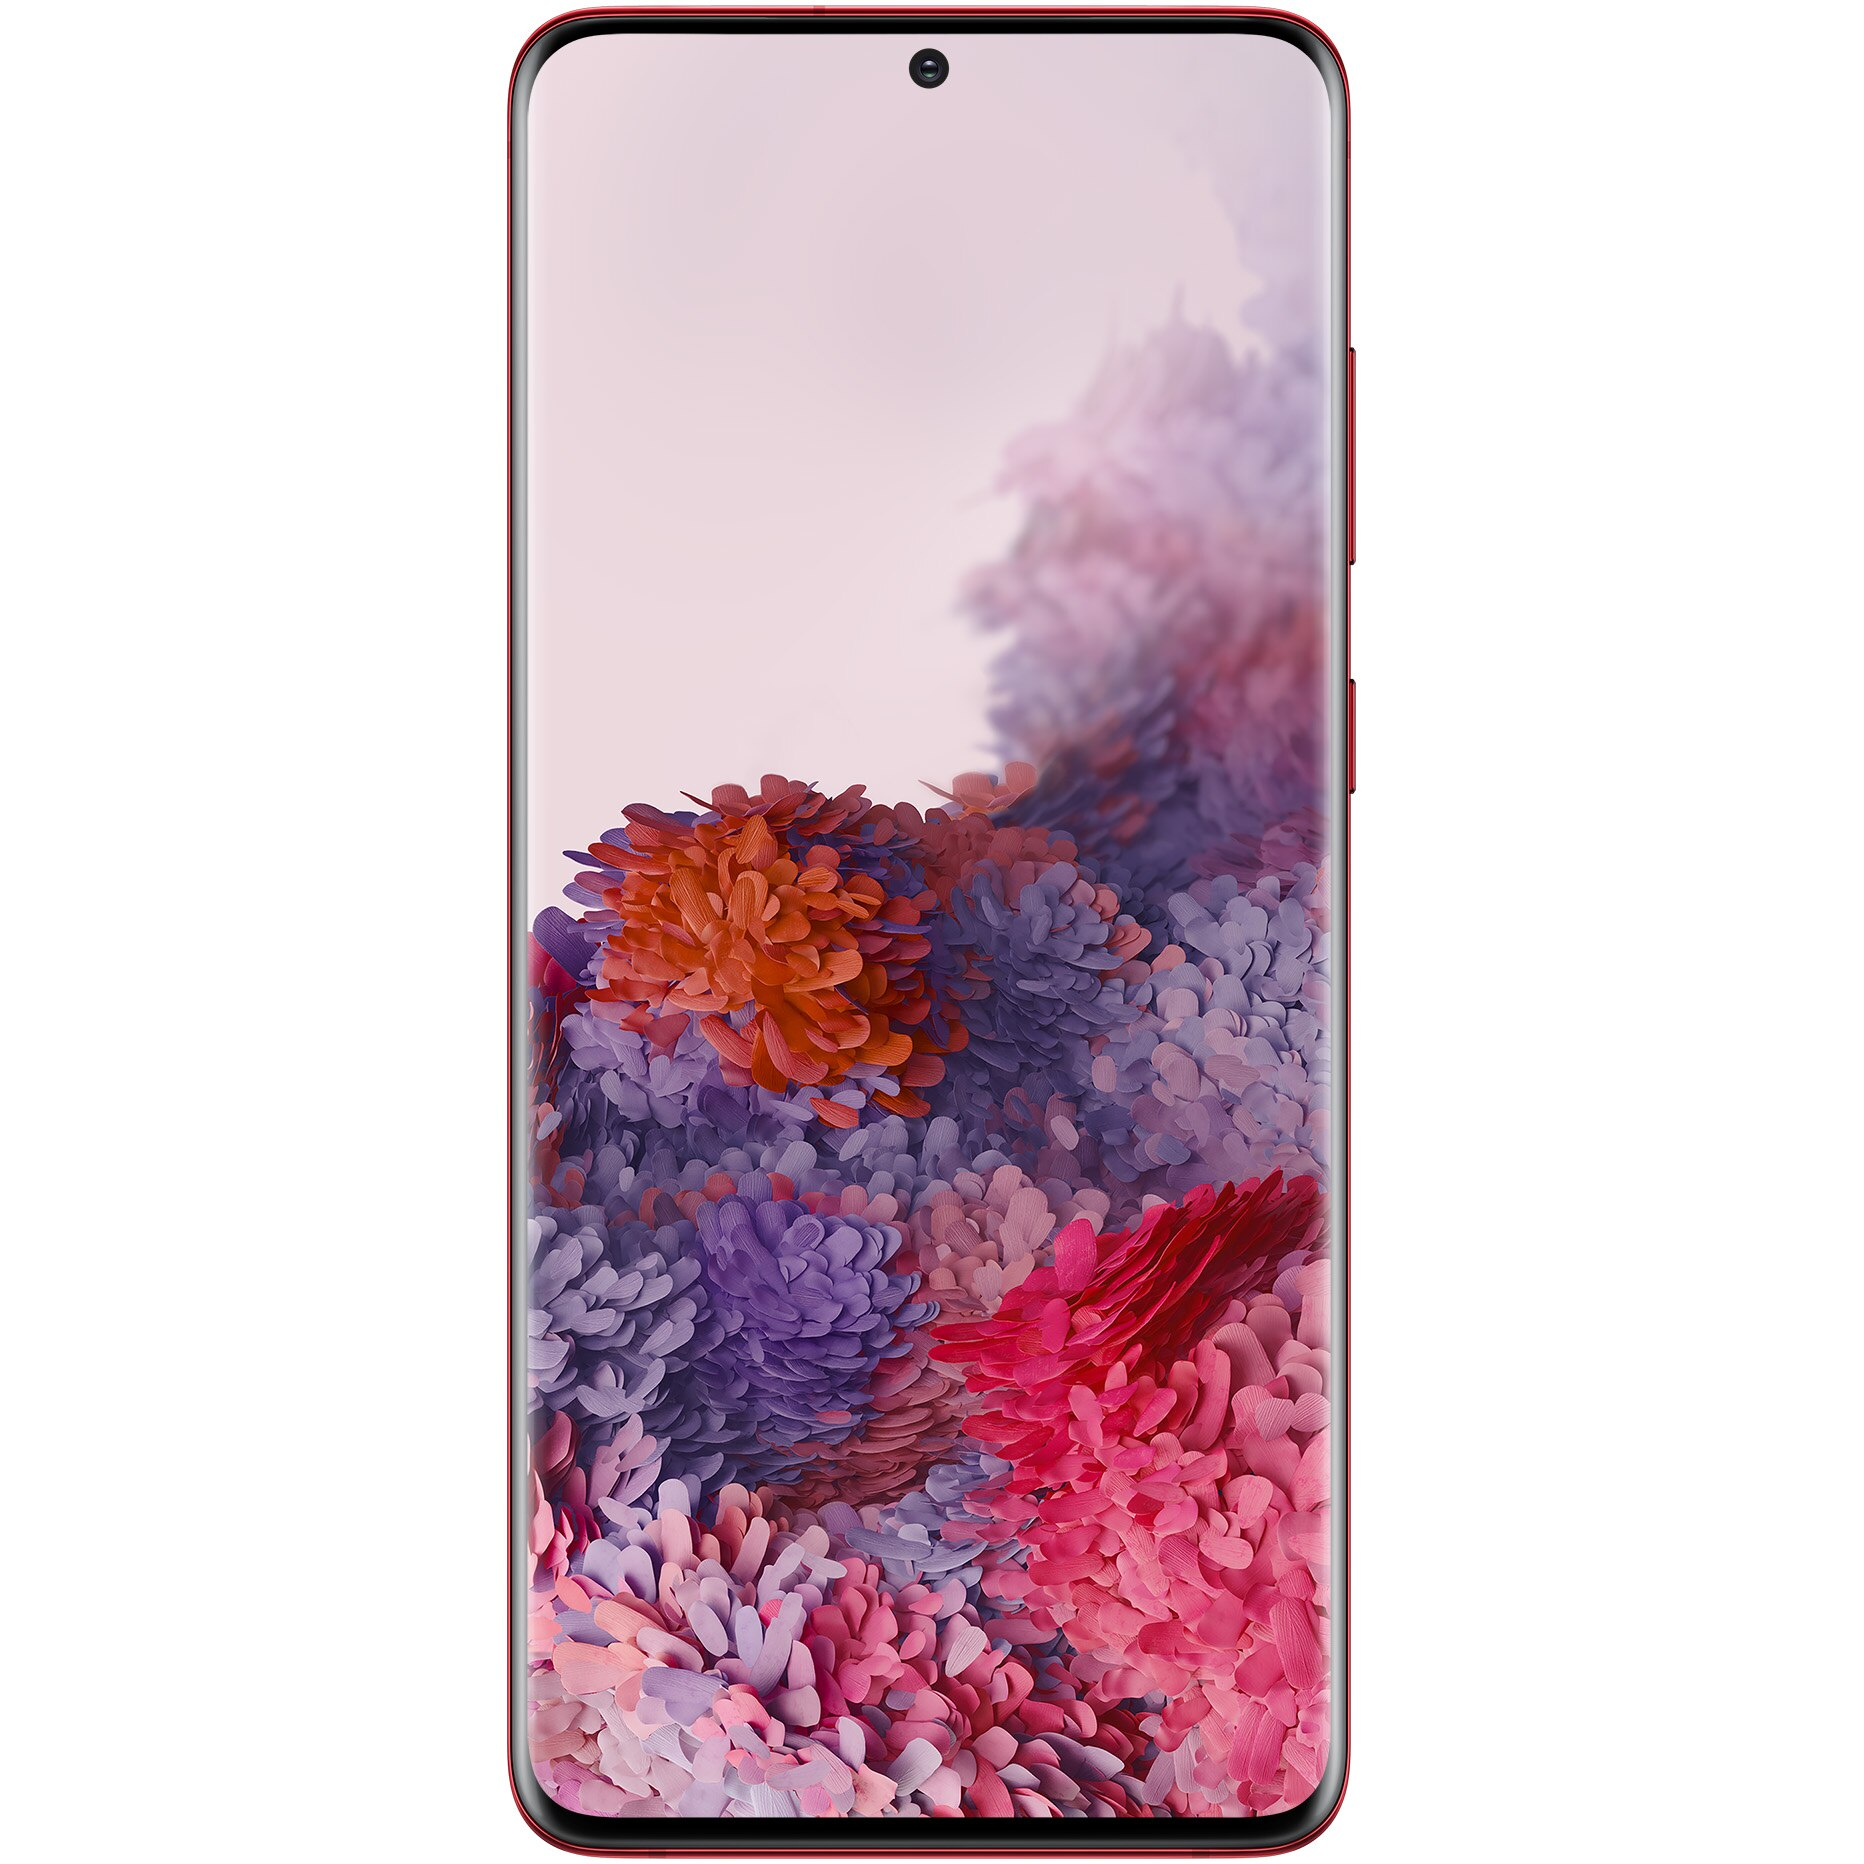 Fotografie Telefon mobil Samsung Galaxy S20 Plus, Dual SIM, 128GB, 12GB RAM, 5G, Aura Red